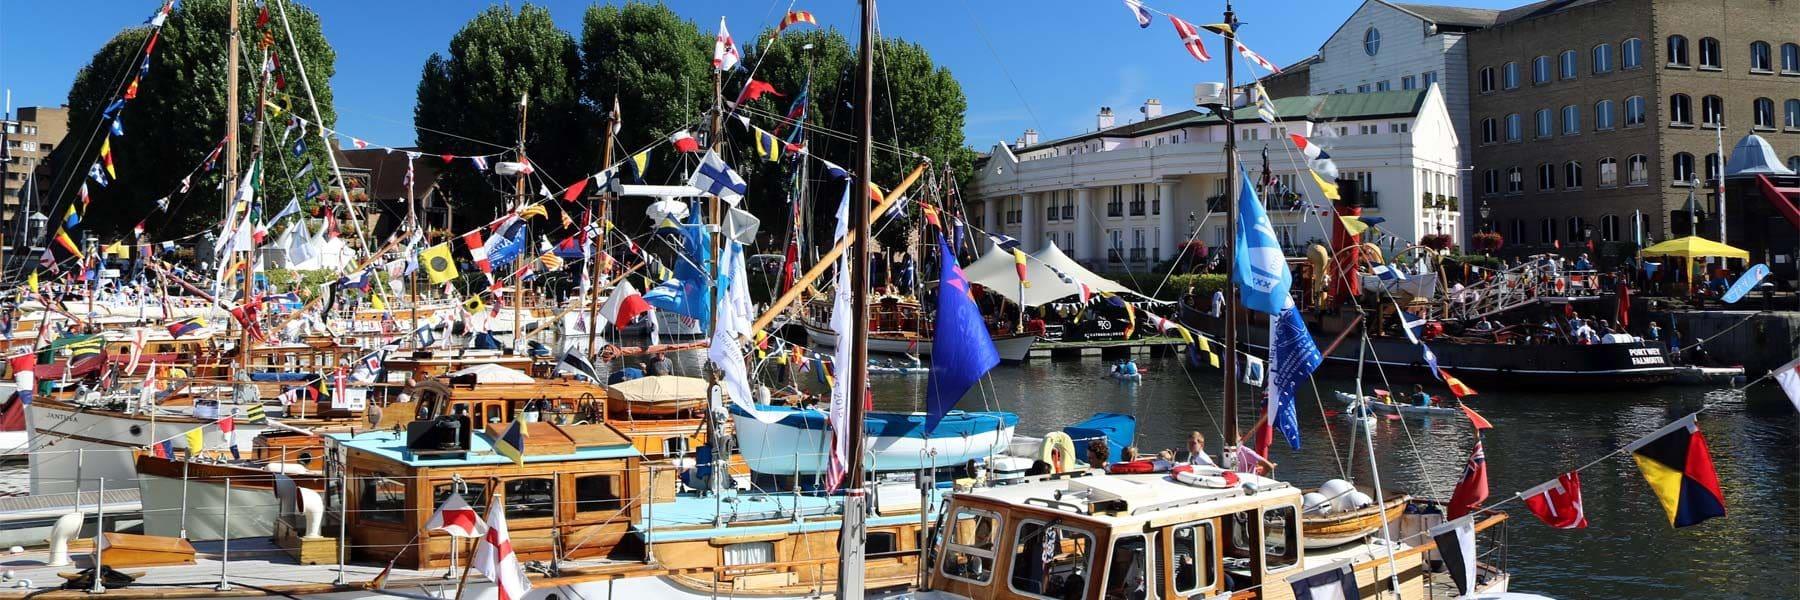 St. Katharine Docks during the Classic Boat Festival